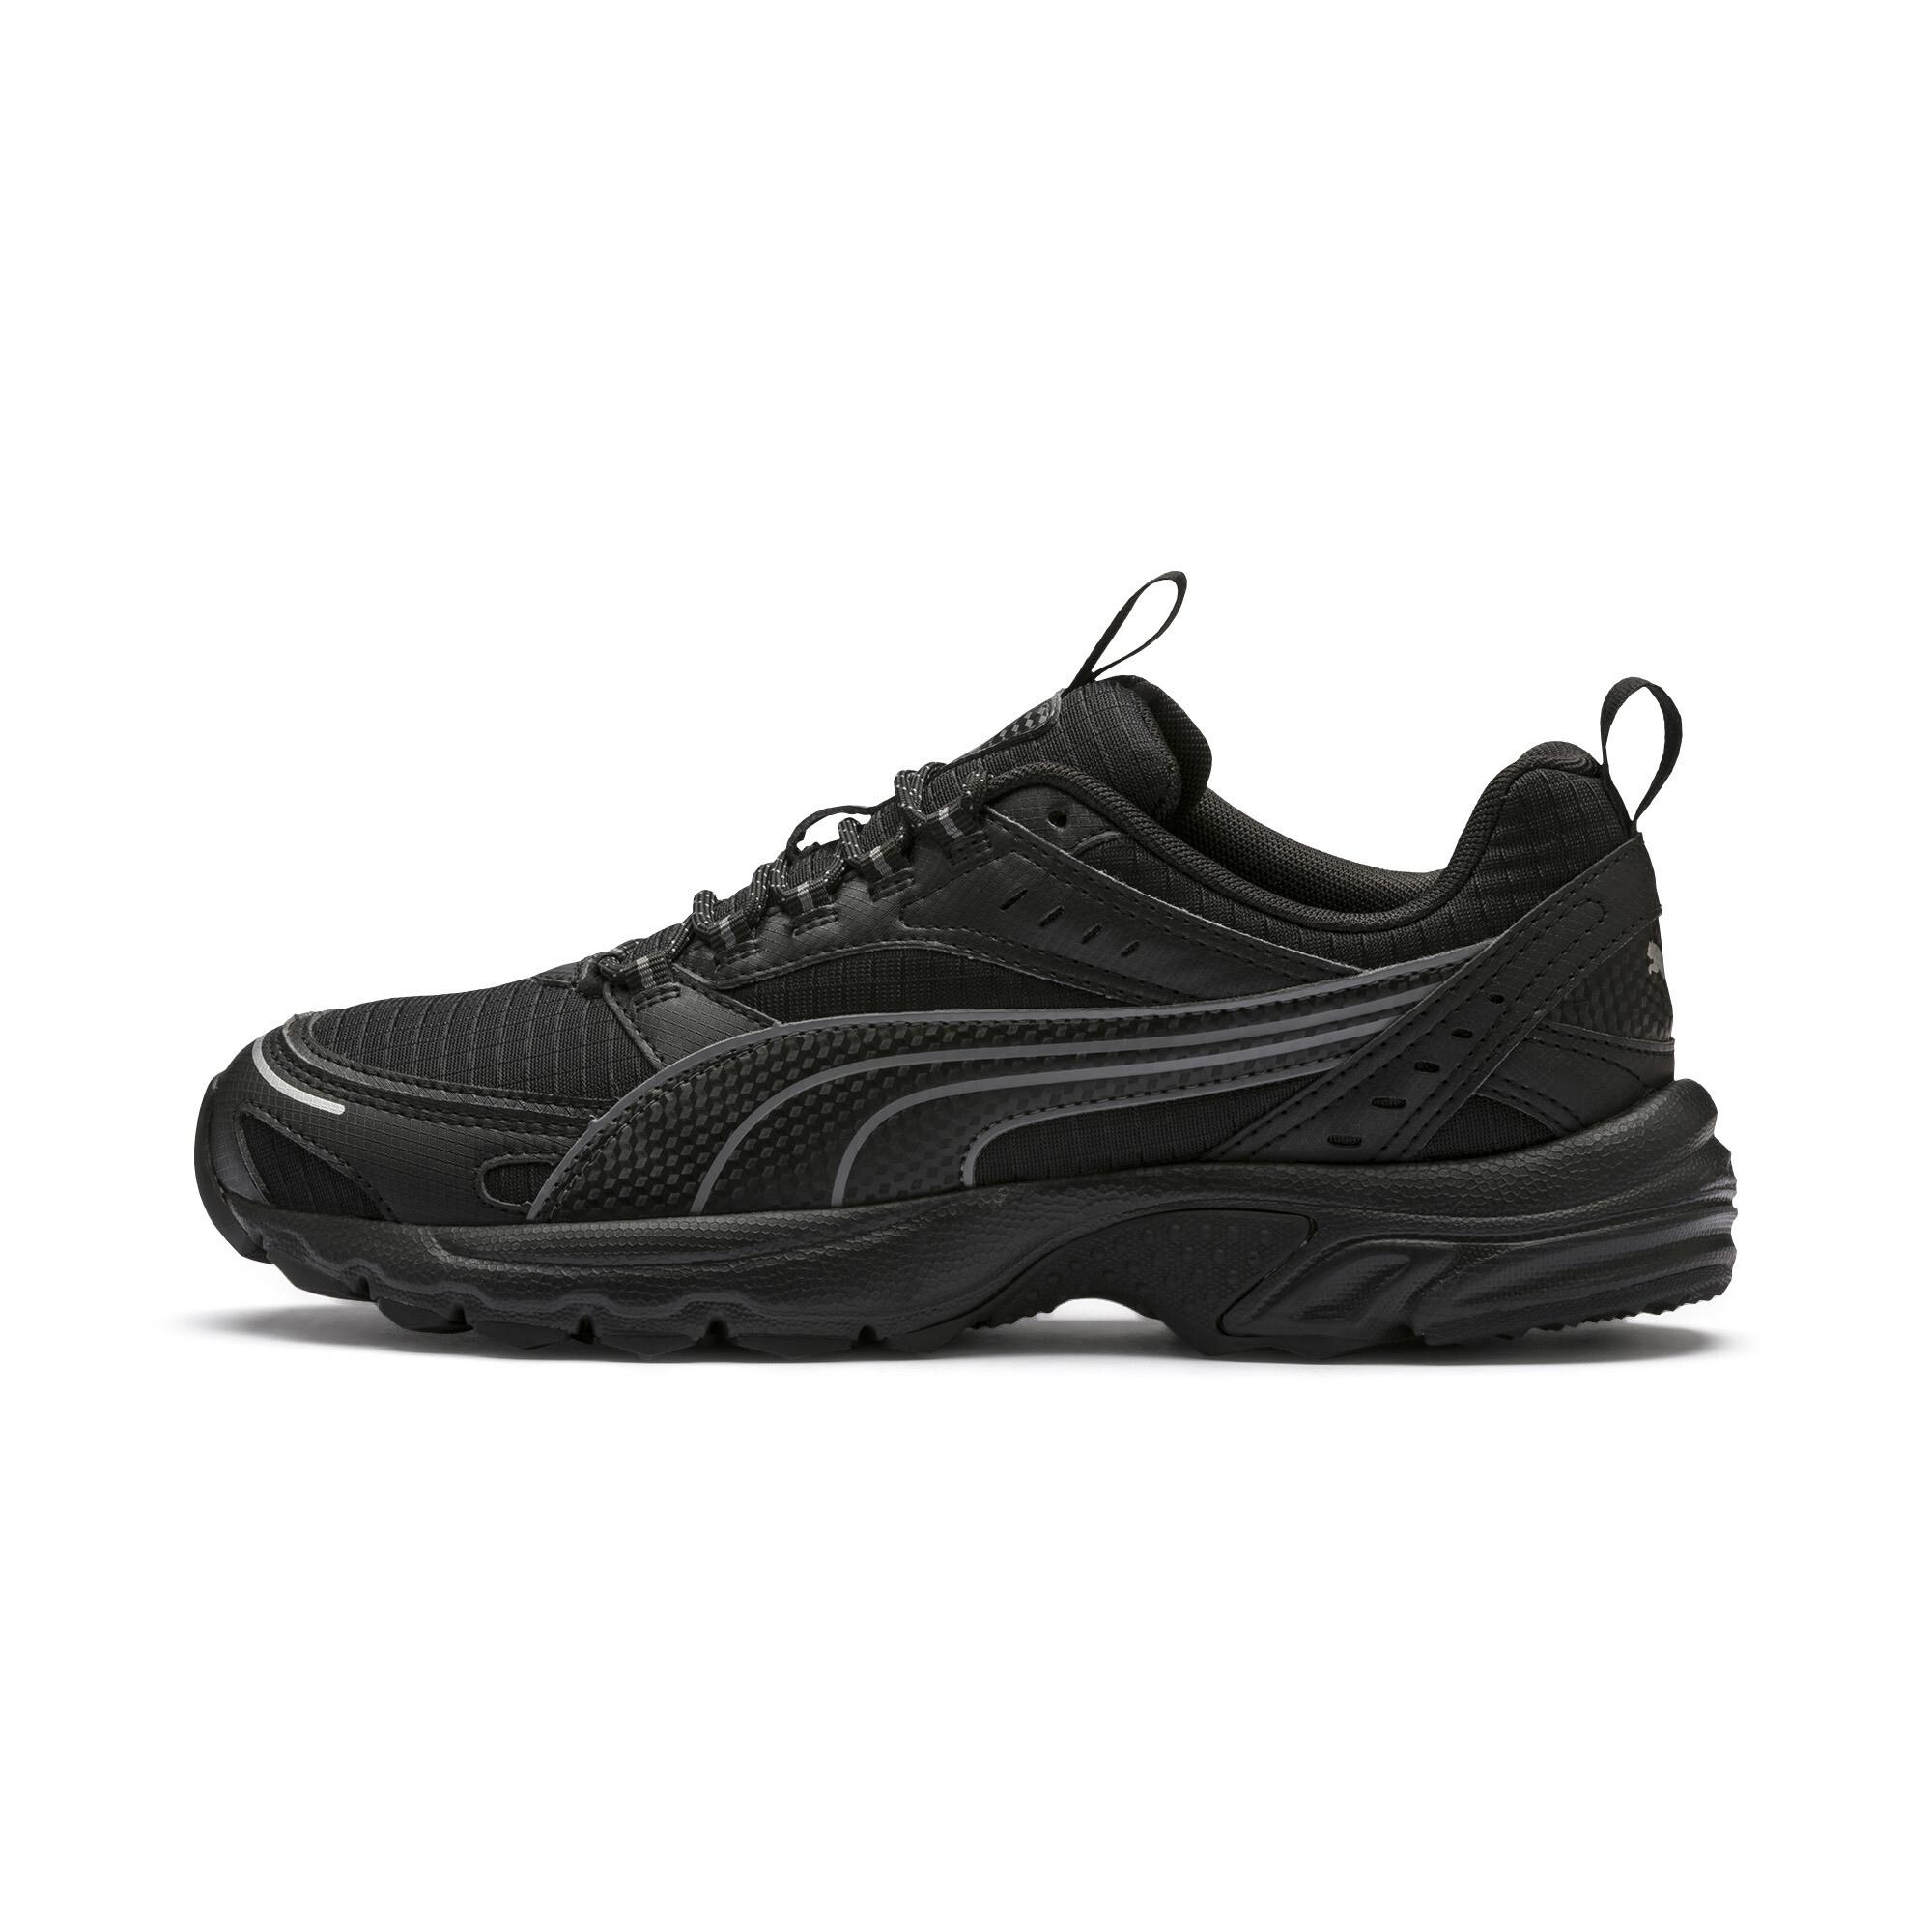 PUMA-Axis-Trail-Sneakers-Men-Shoe-Basics miniature 4